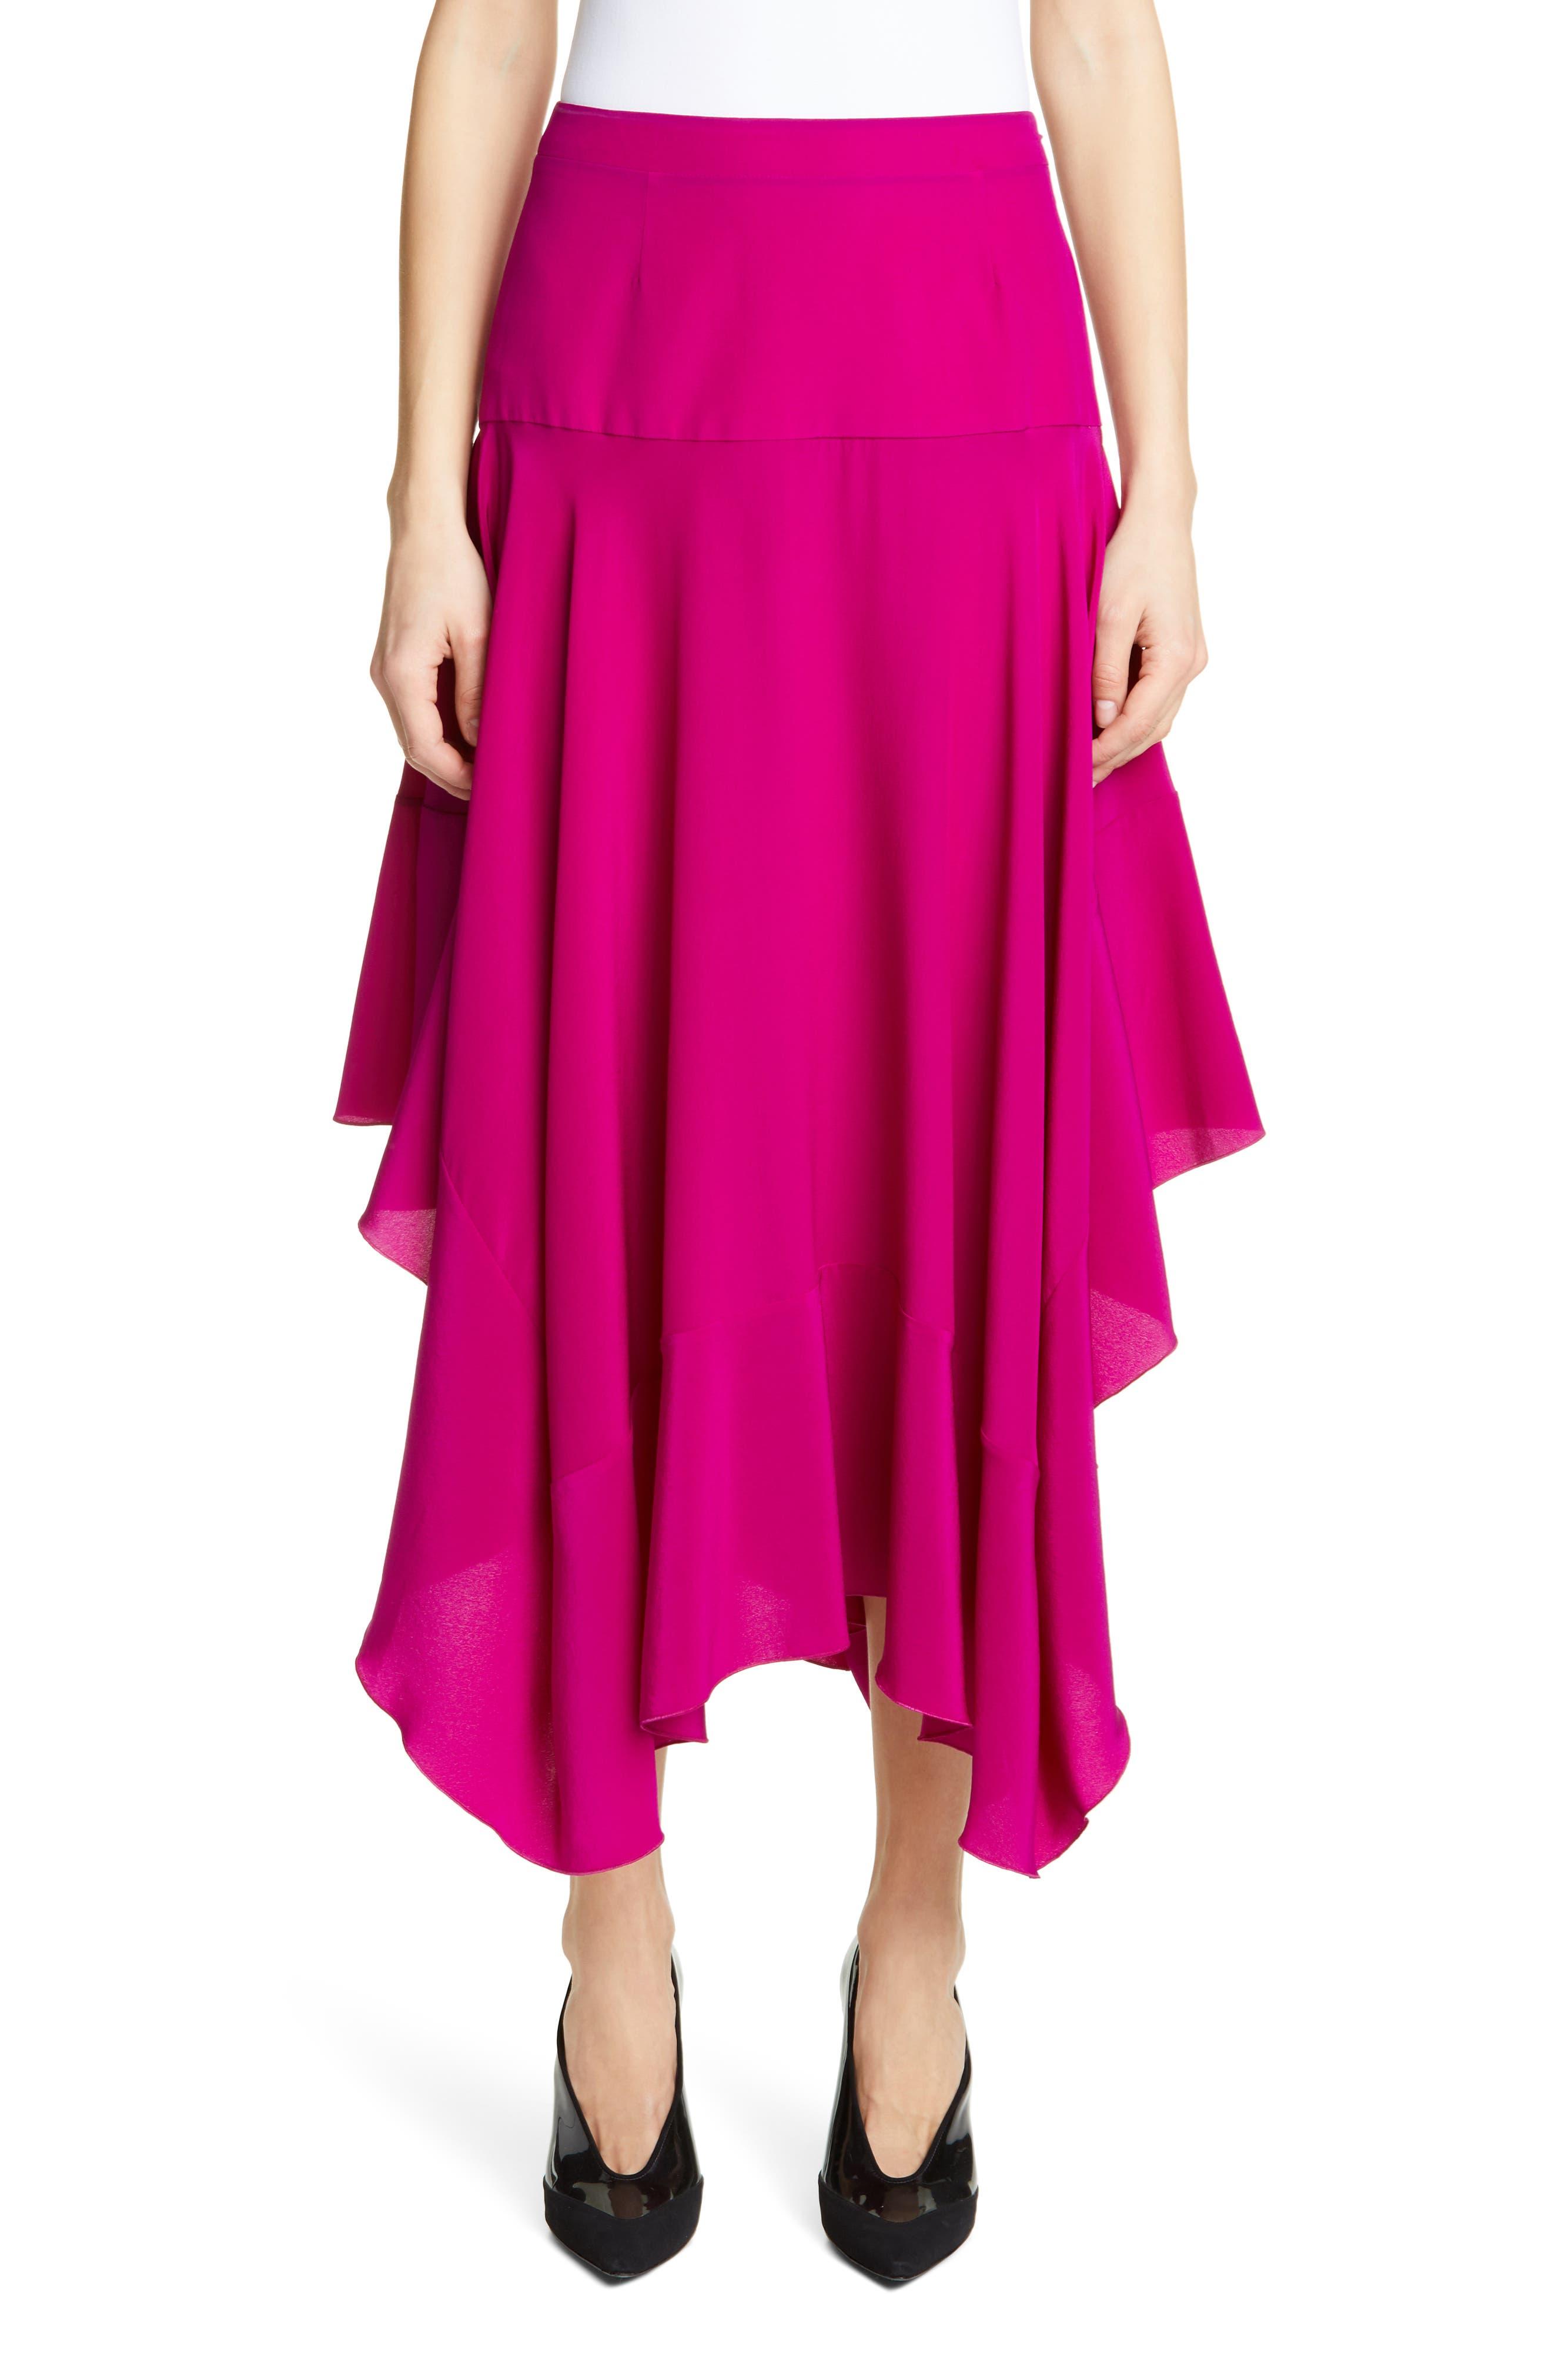 Stella Mccartney Skirts Silk Crêpe de Chine Asymmetrical Midi Skirt